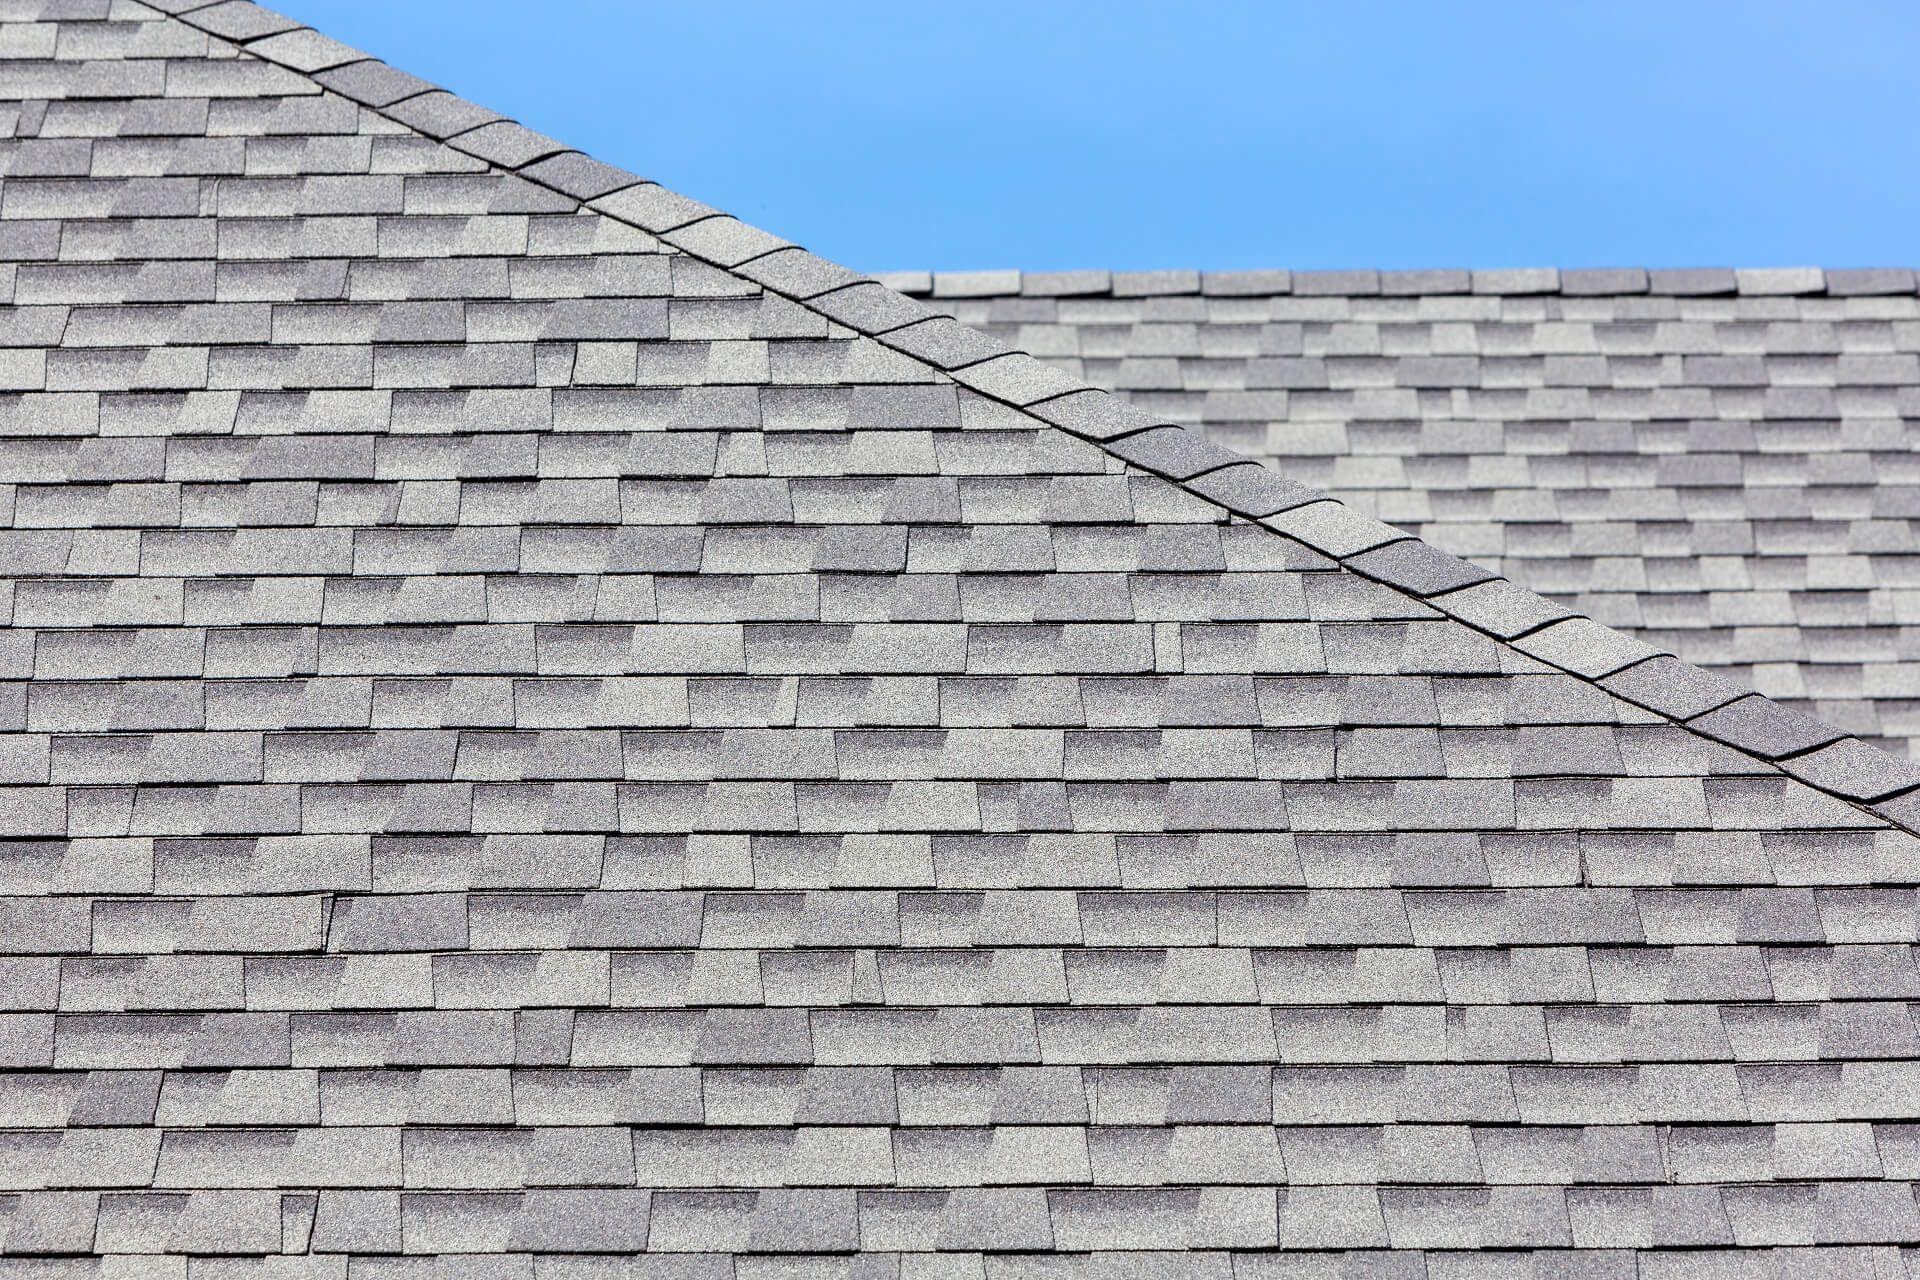 Best Asphalt Roof Shingles Peachtree City Ga Architectural 400 x 300